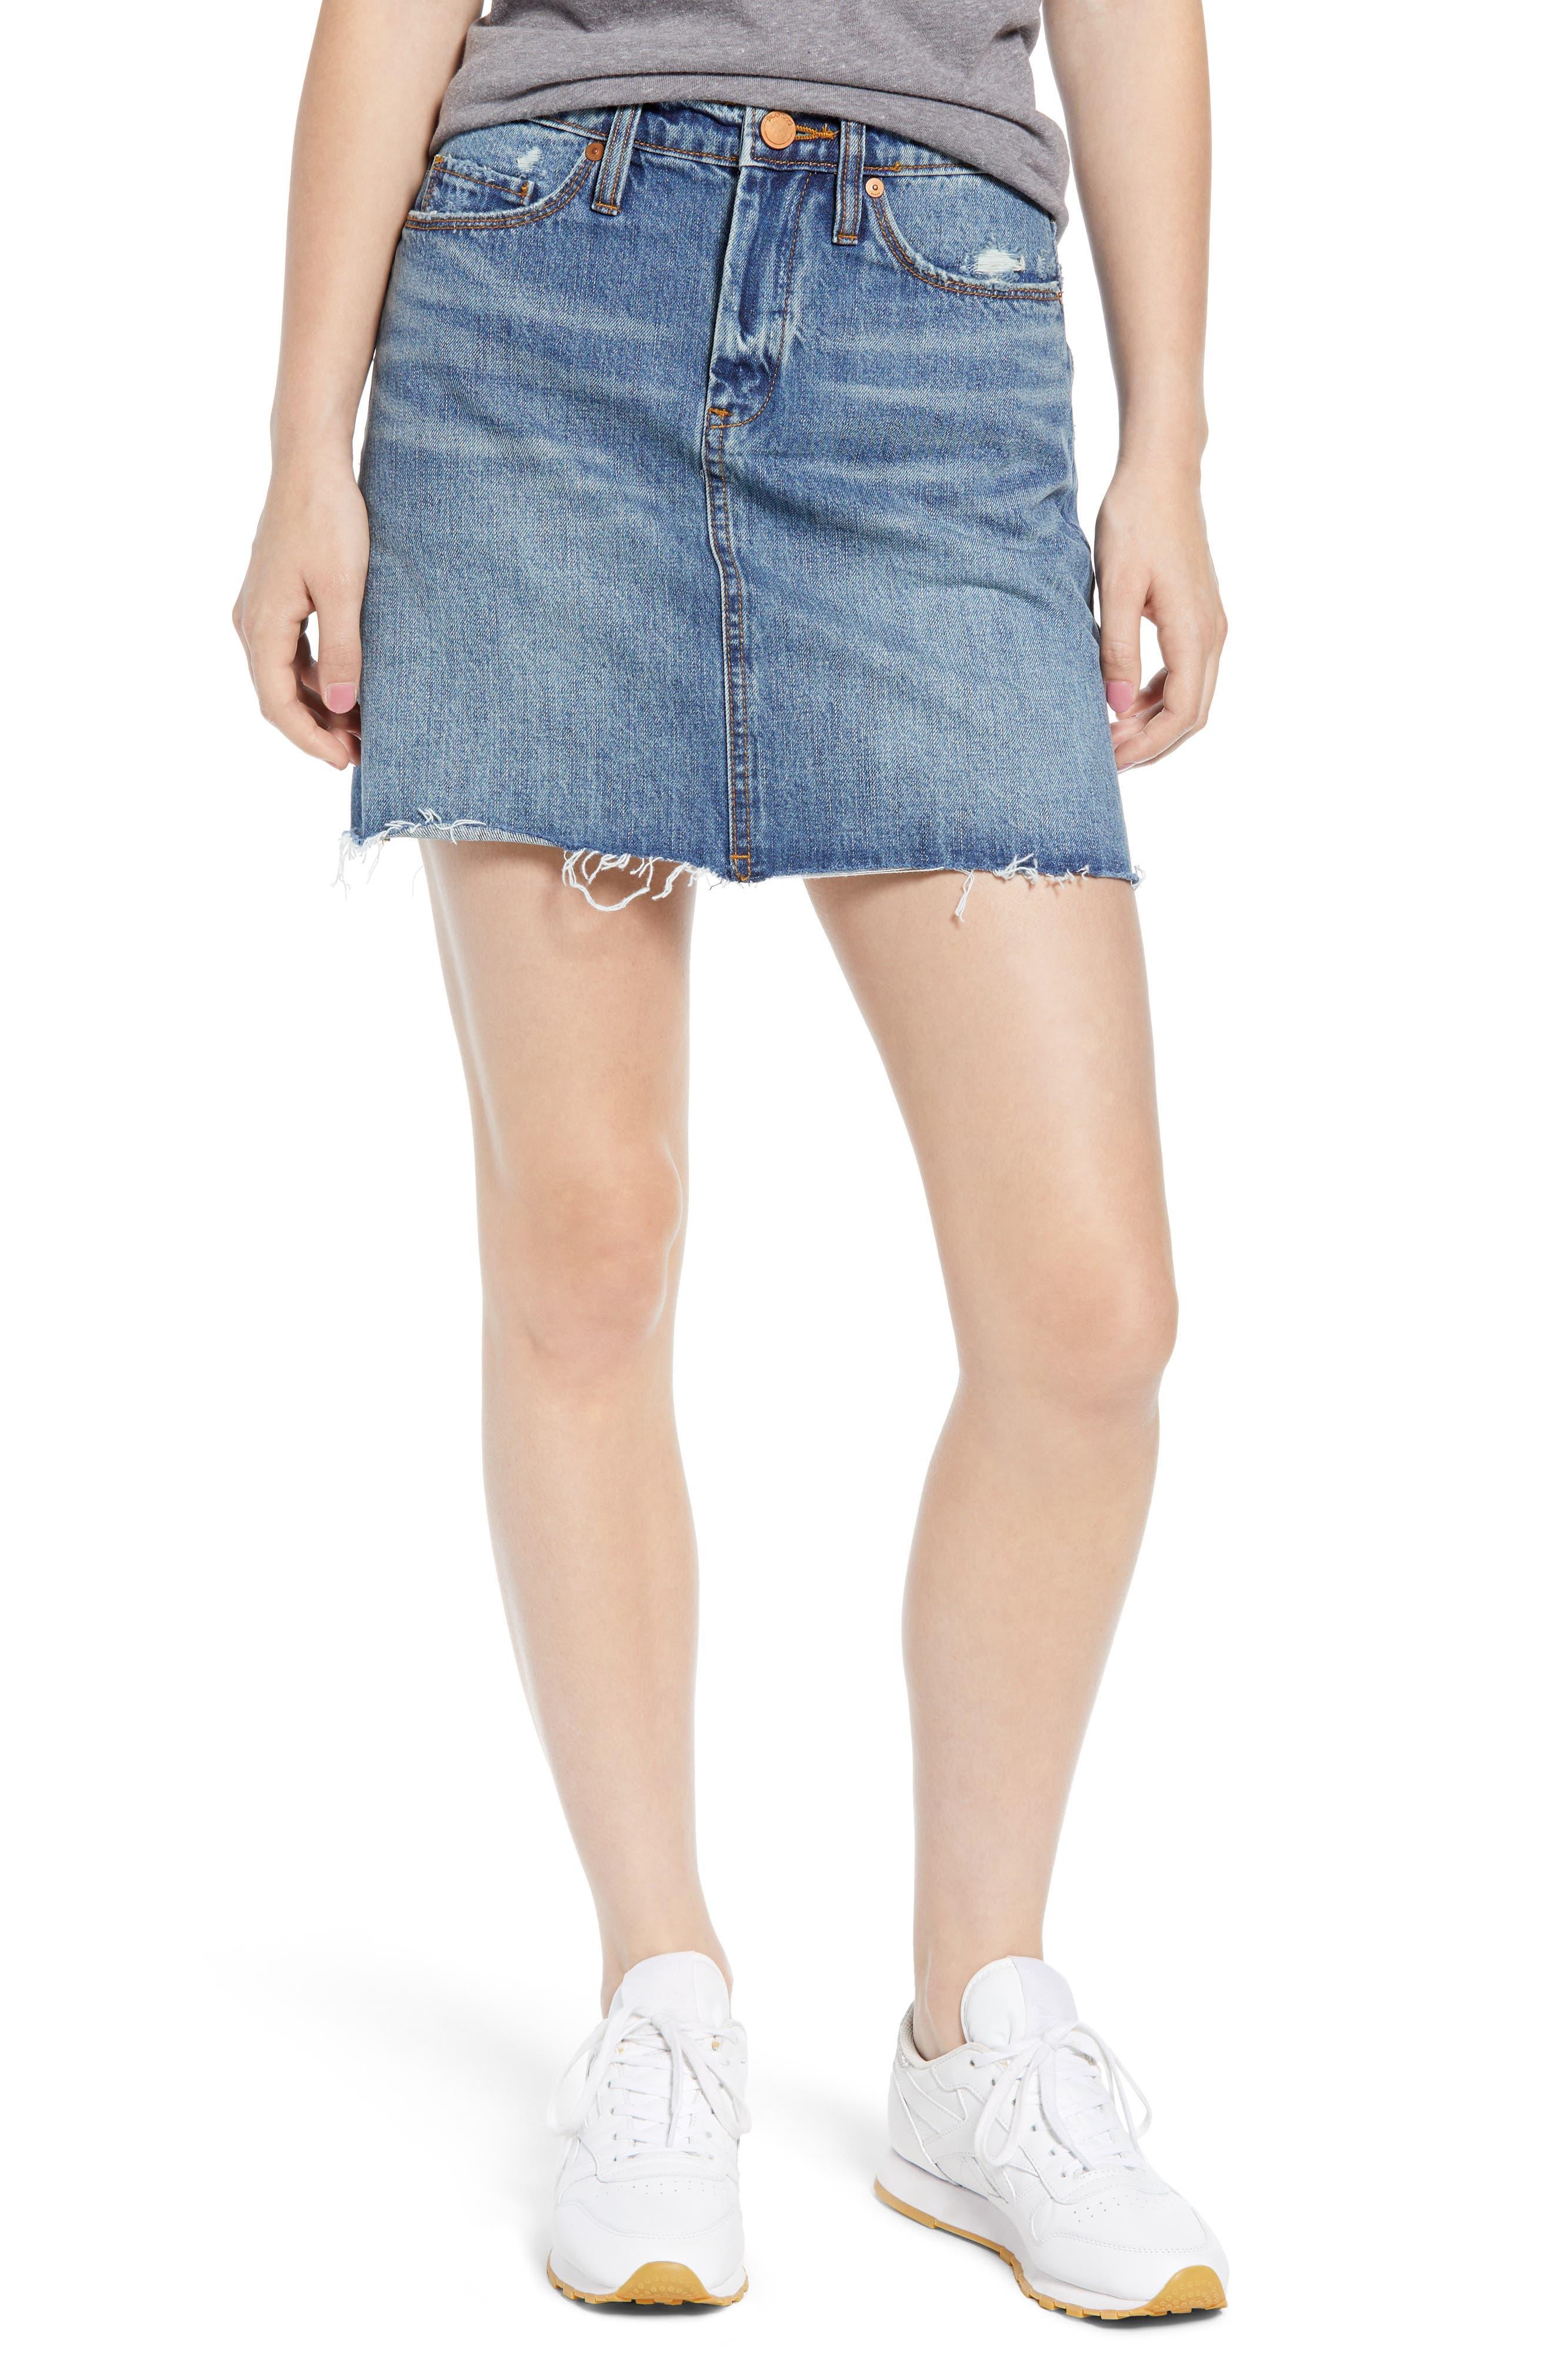 BLANKNYC Way Back When Cutoff Denim Skirt, Main, color, 400